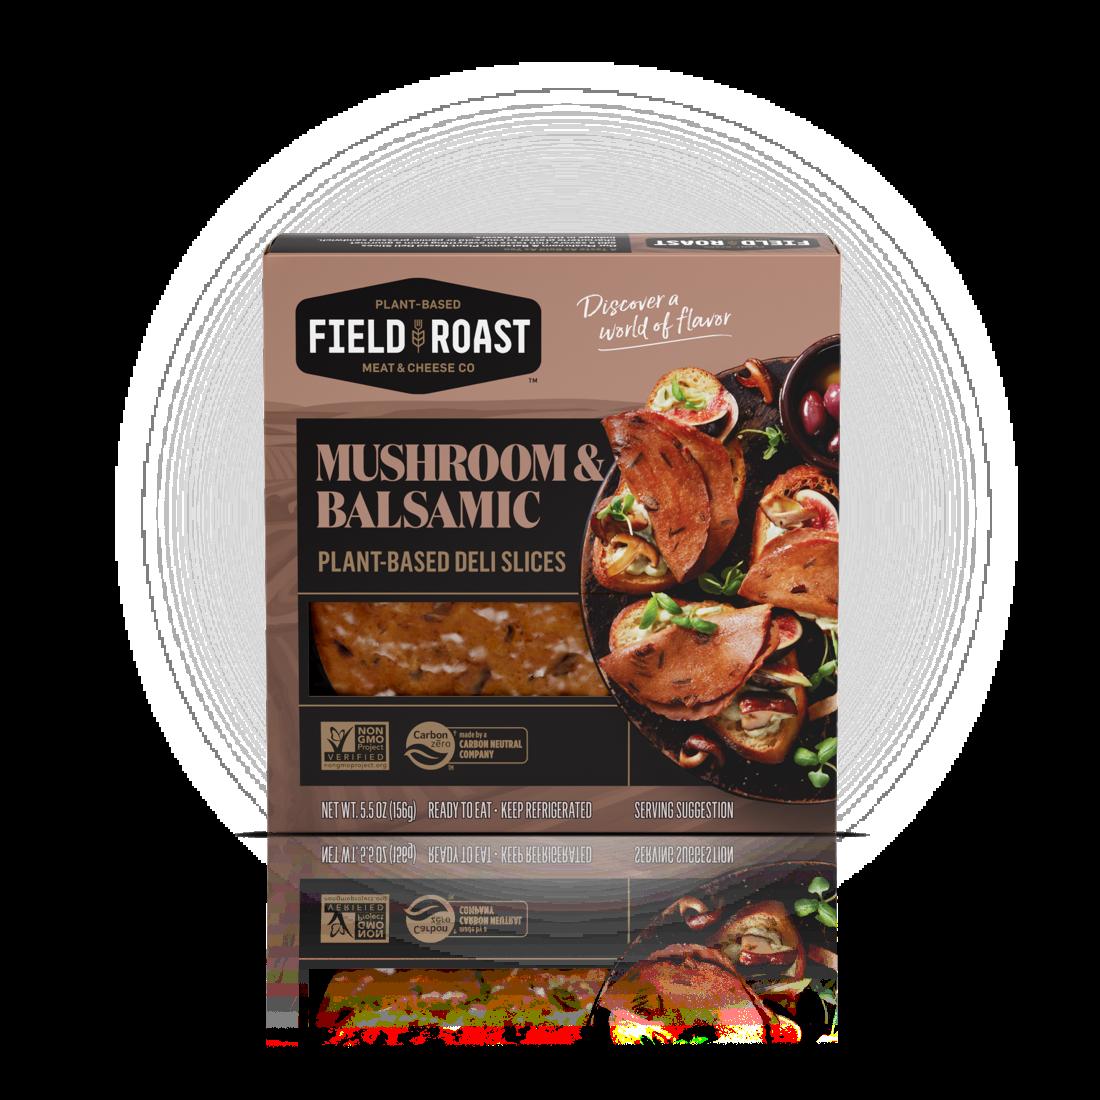 Mushroom & Balsamic